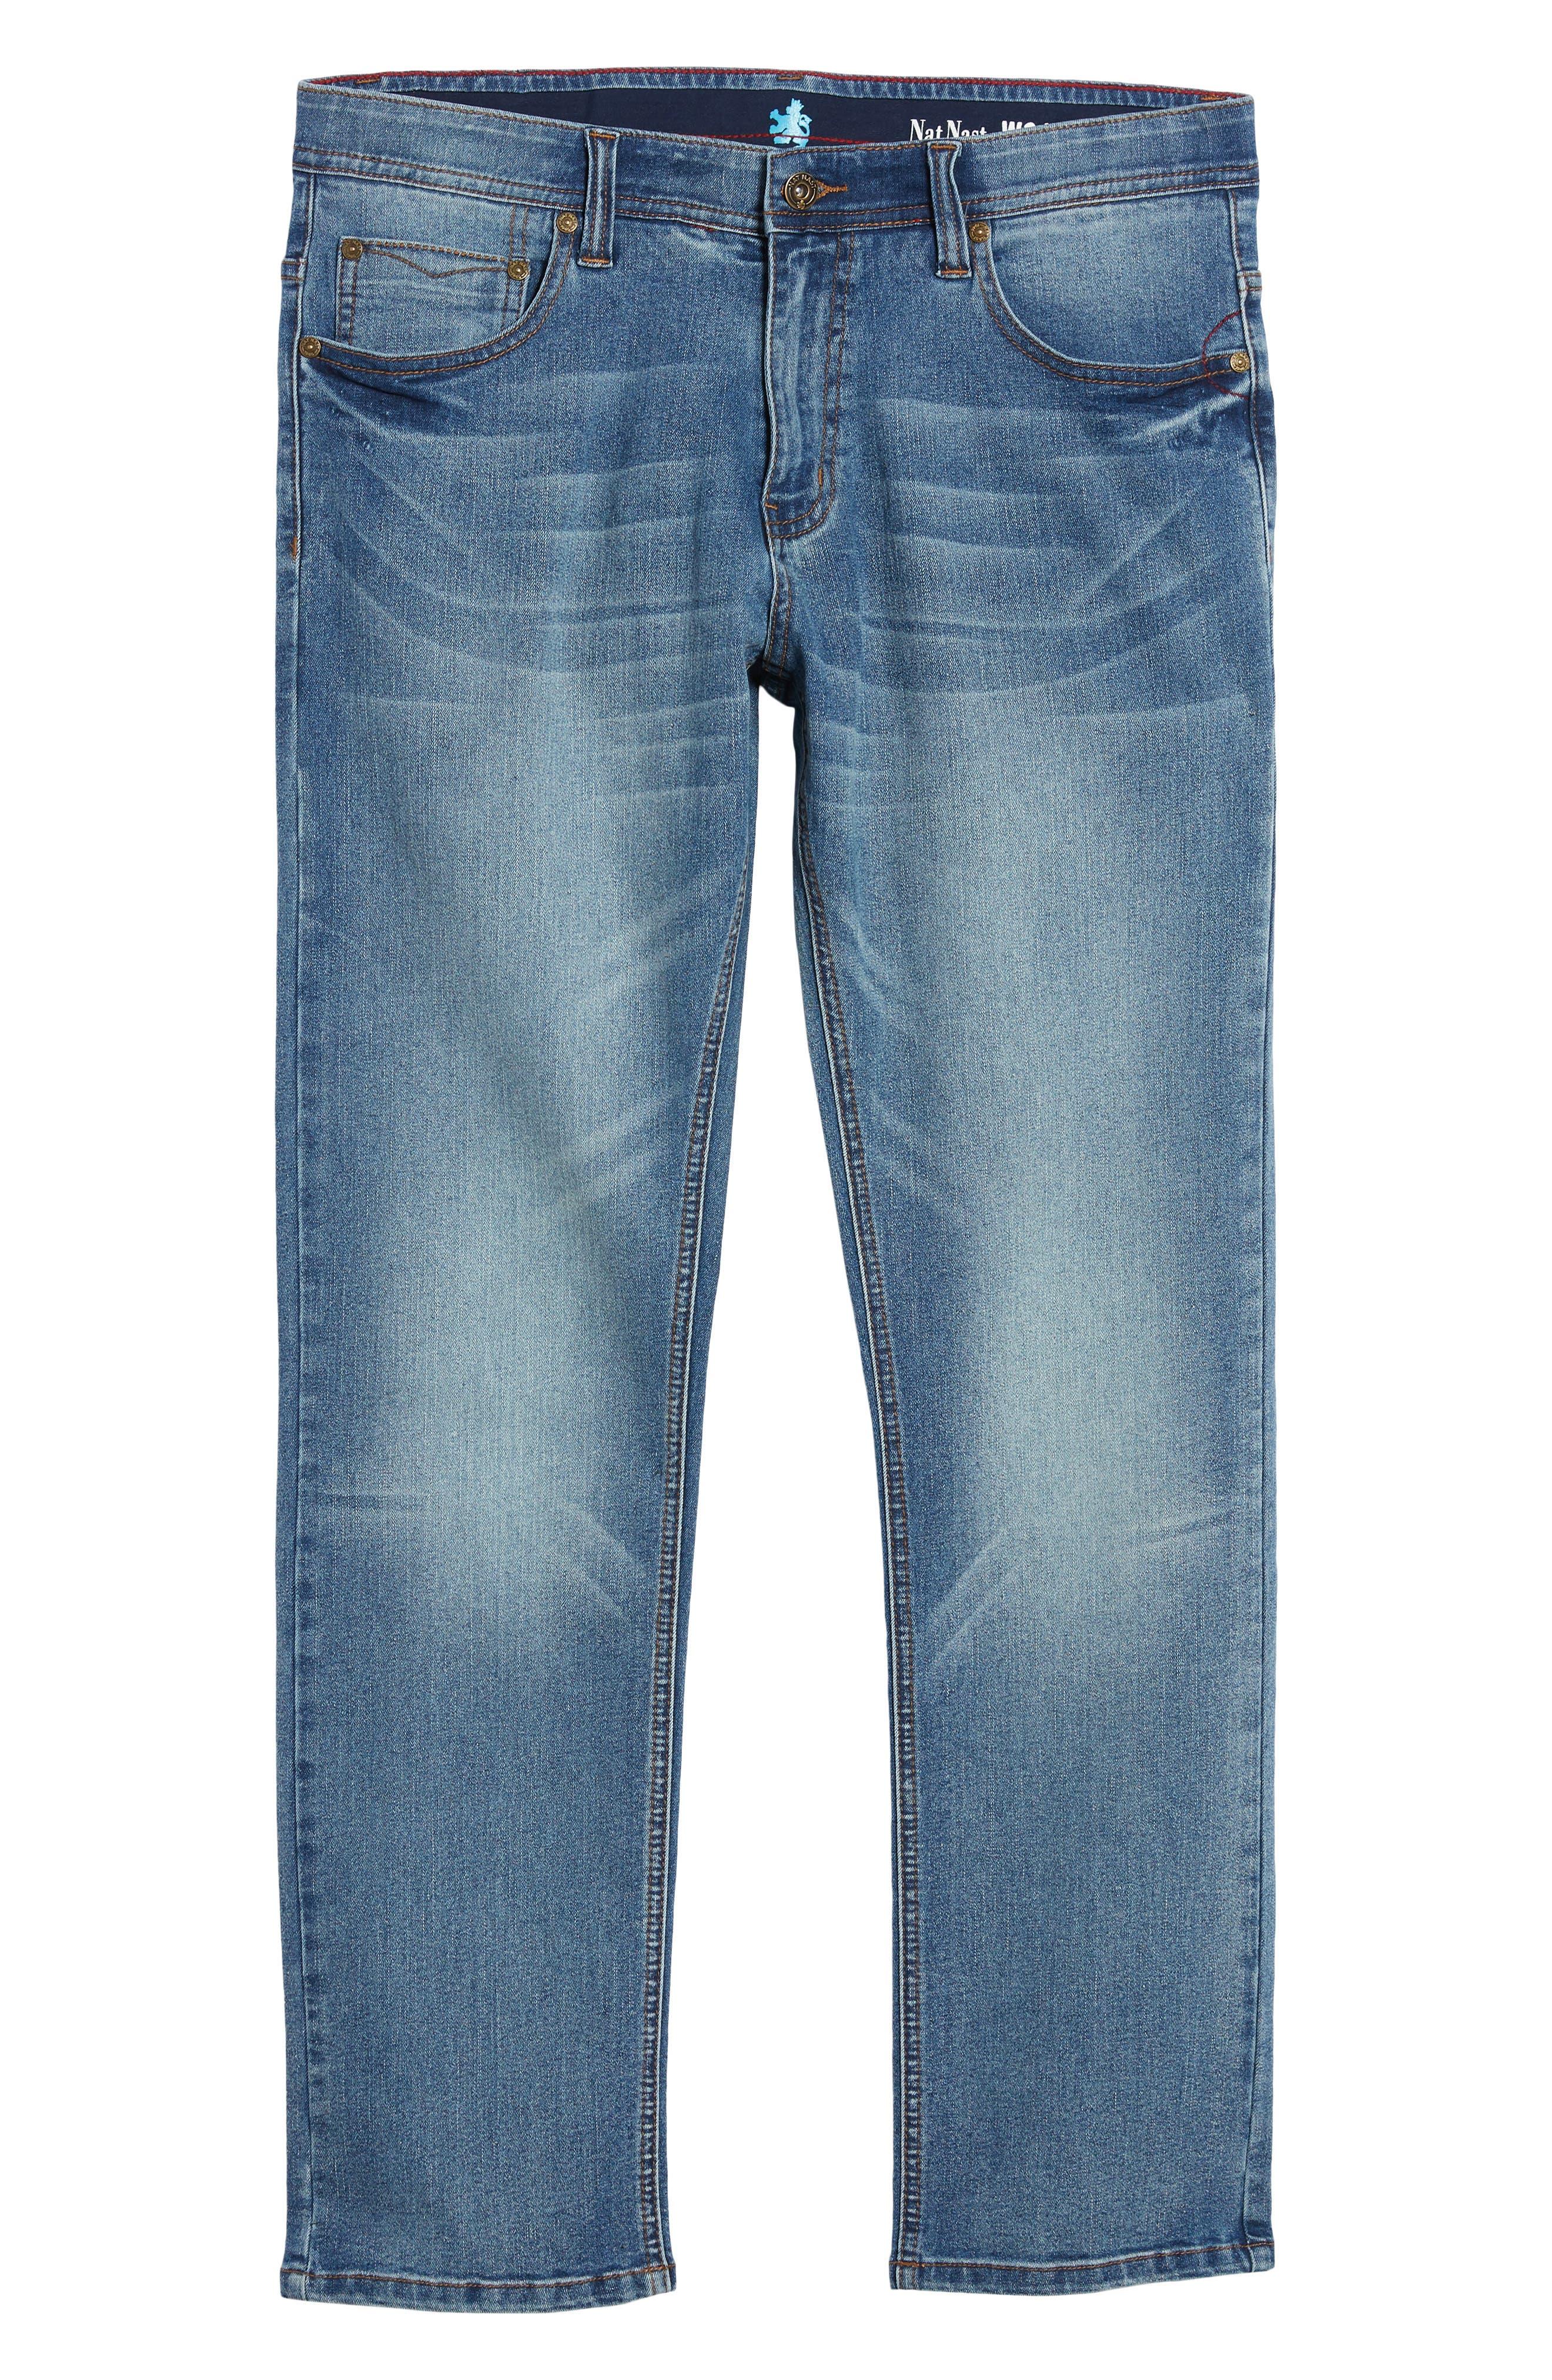 Maverick Stretch Slim Fit Jeans,                             Alternate thumbnail 6, color,                             Beach Wash